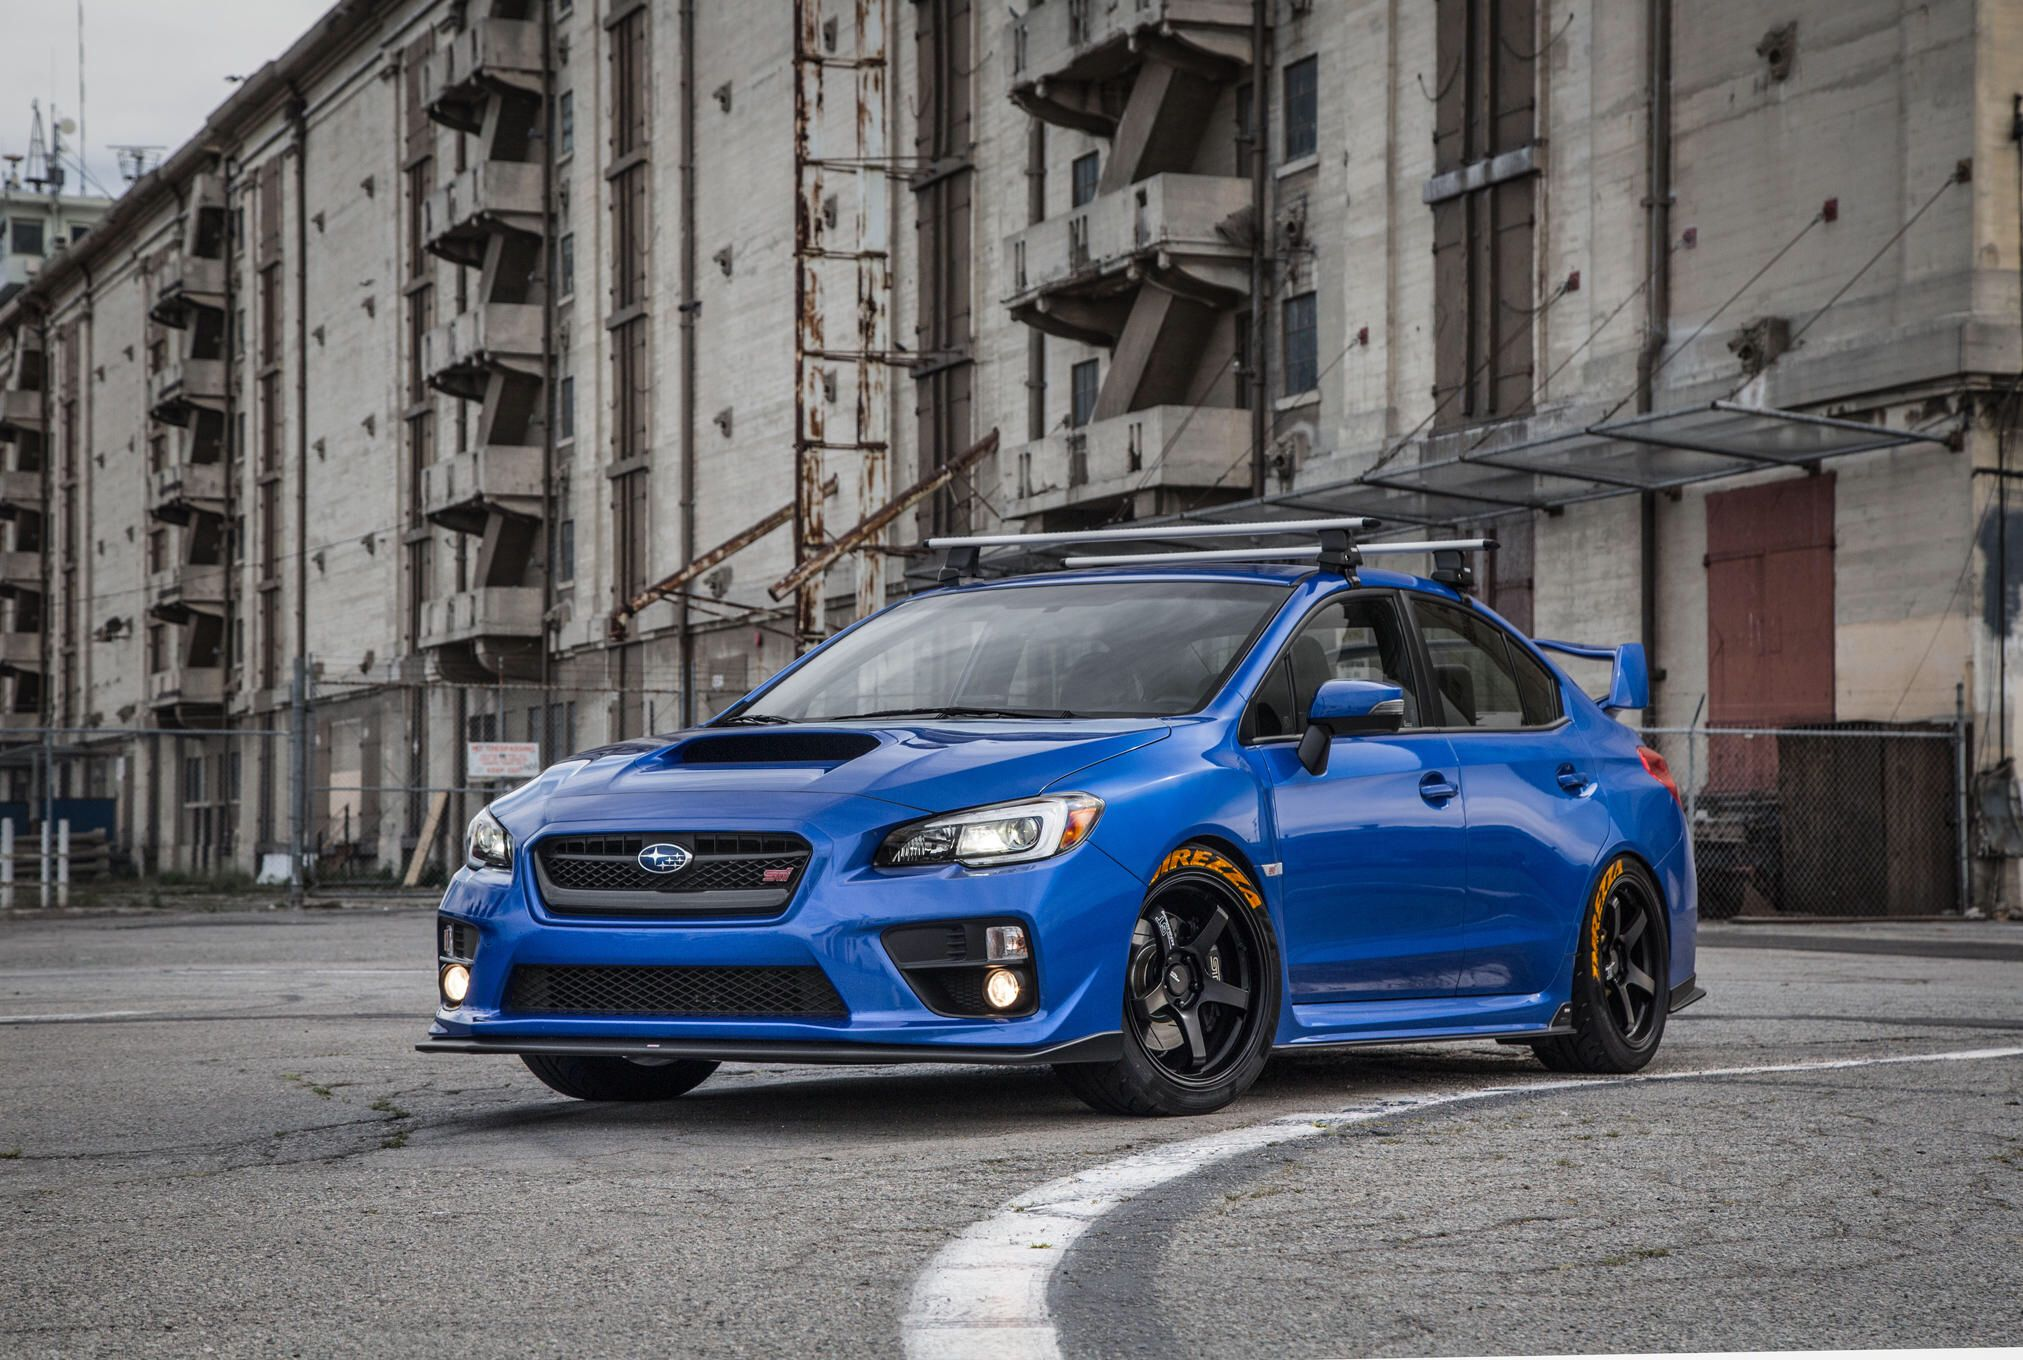 2017 Subaru Wrx Gets Modest Price Increase Motor Trend Wrx Subaru Wrx Subaru